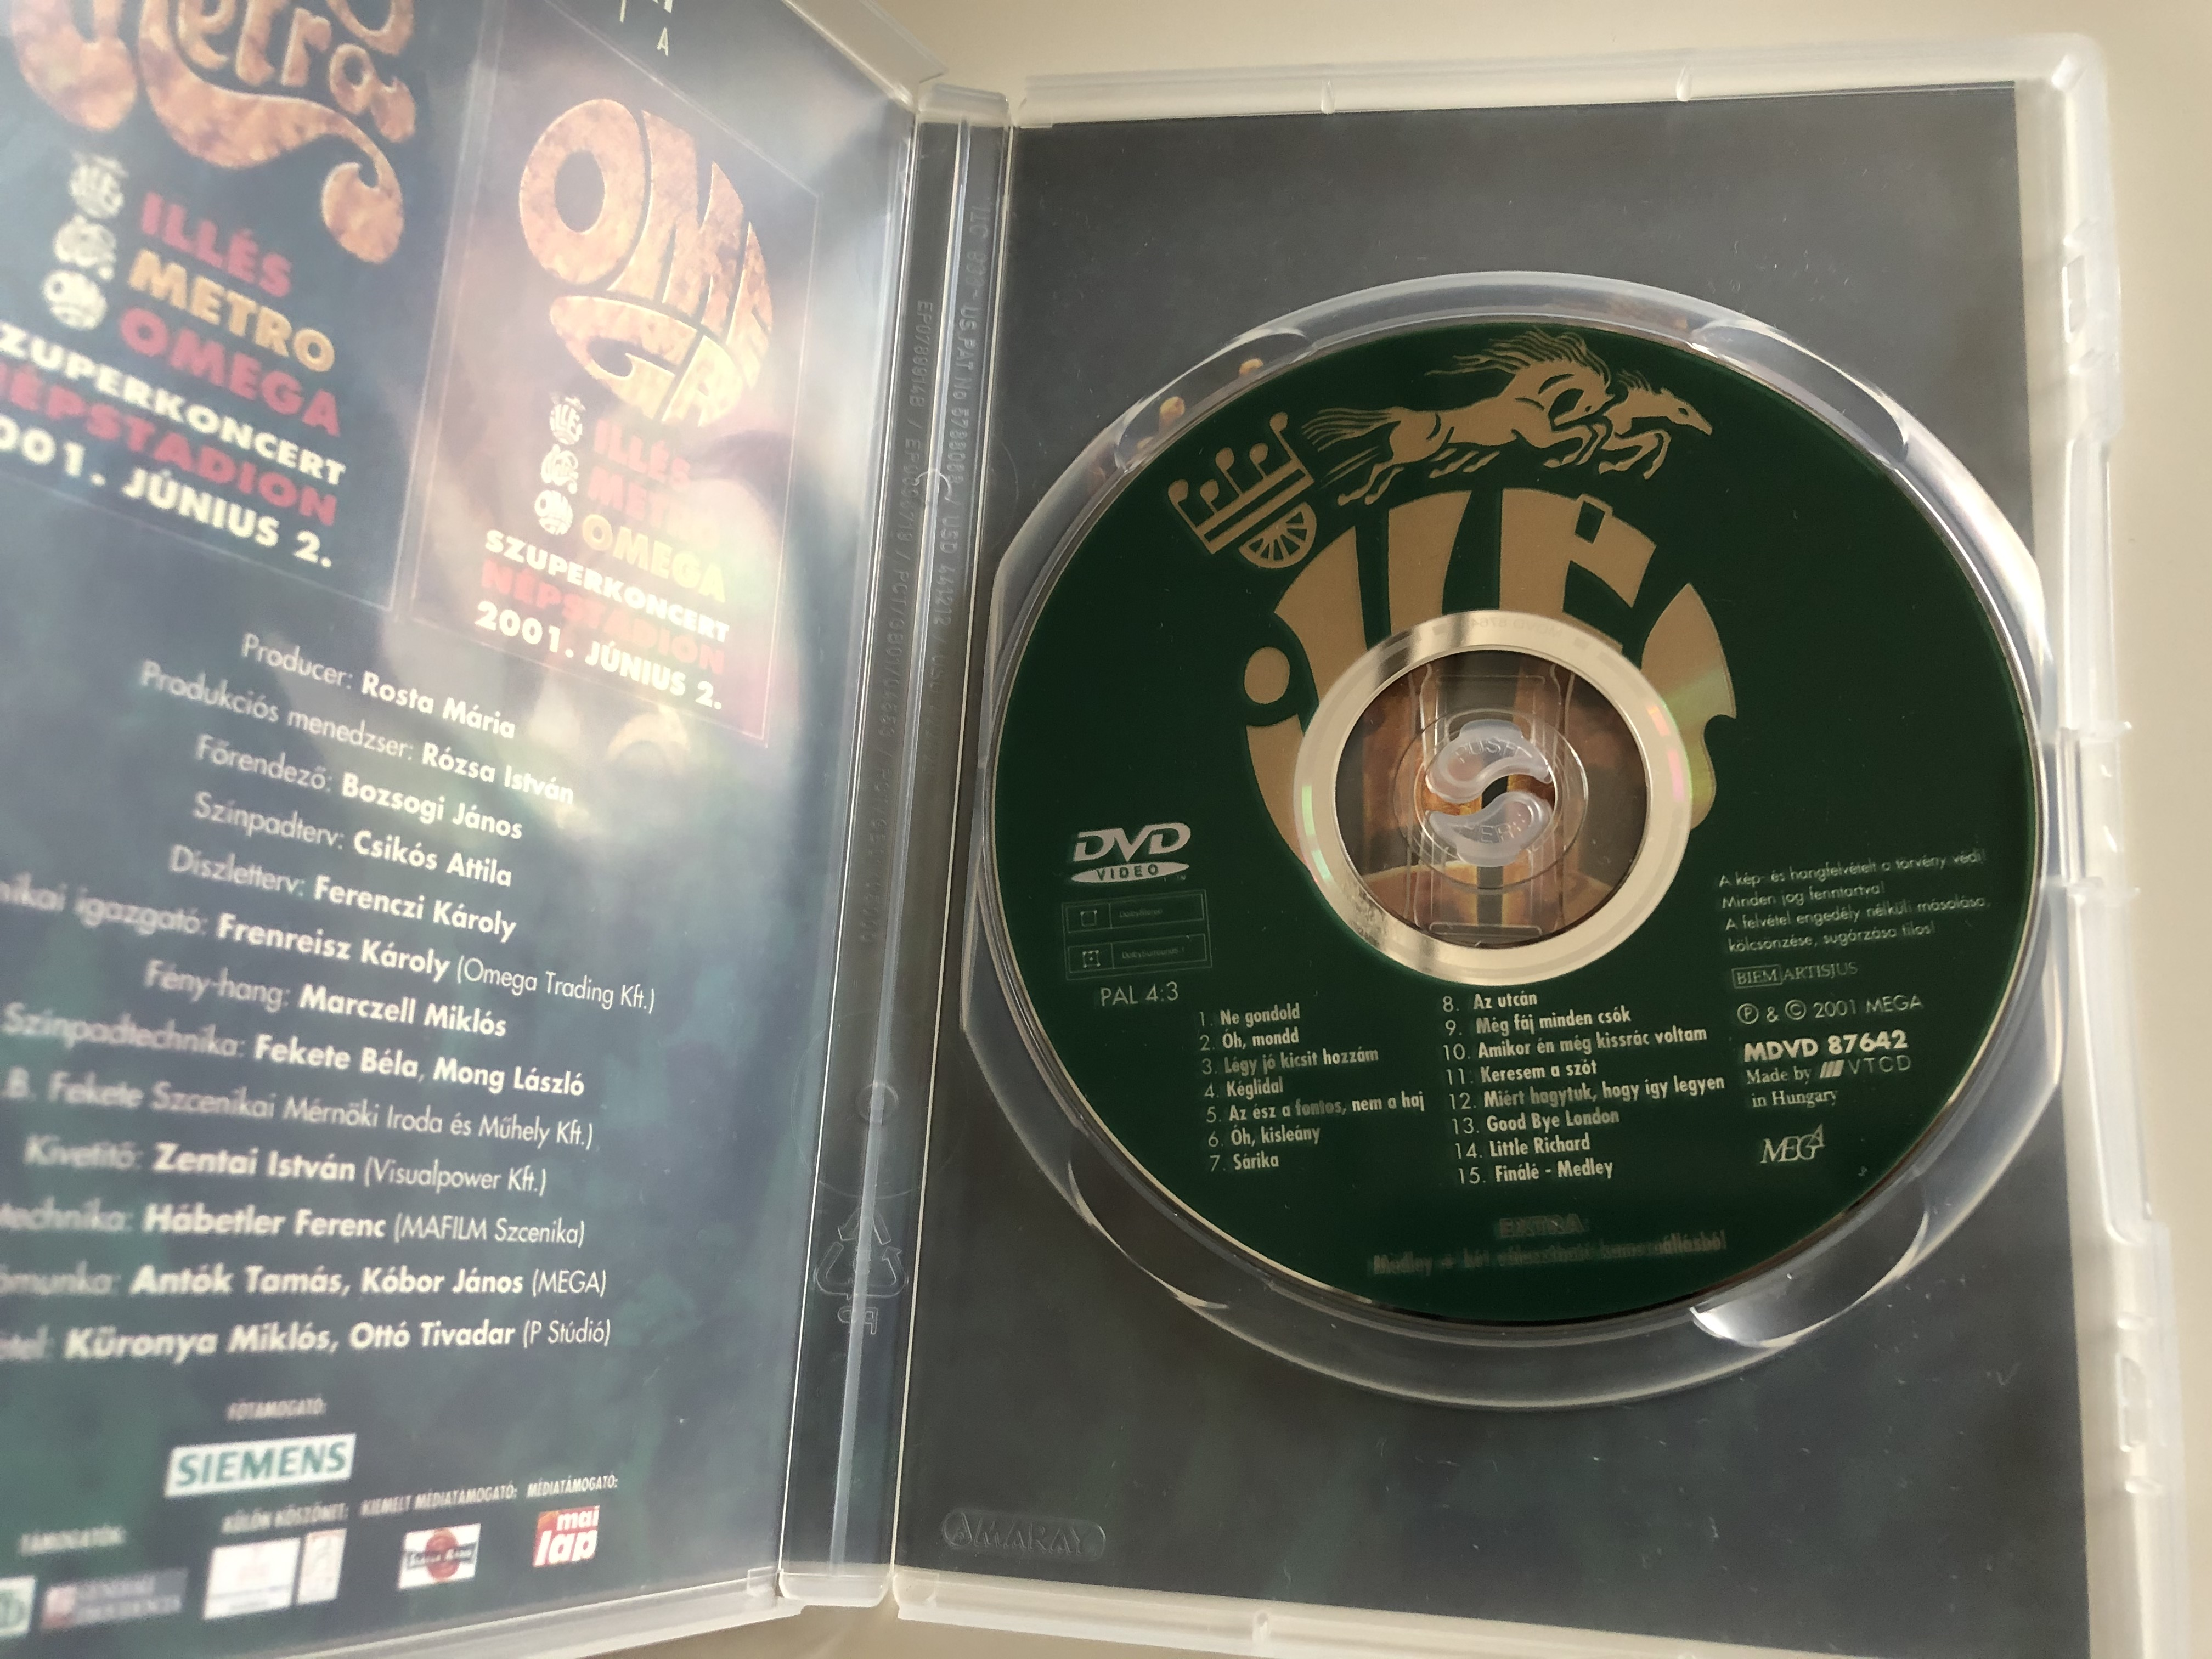 ill-s-szuperkoncert-dvd-2001-n-pstadion-2001-j-nius-2-2.jpg